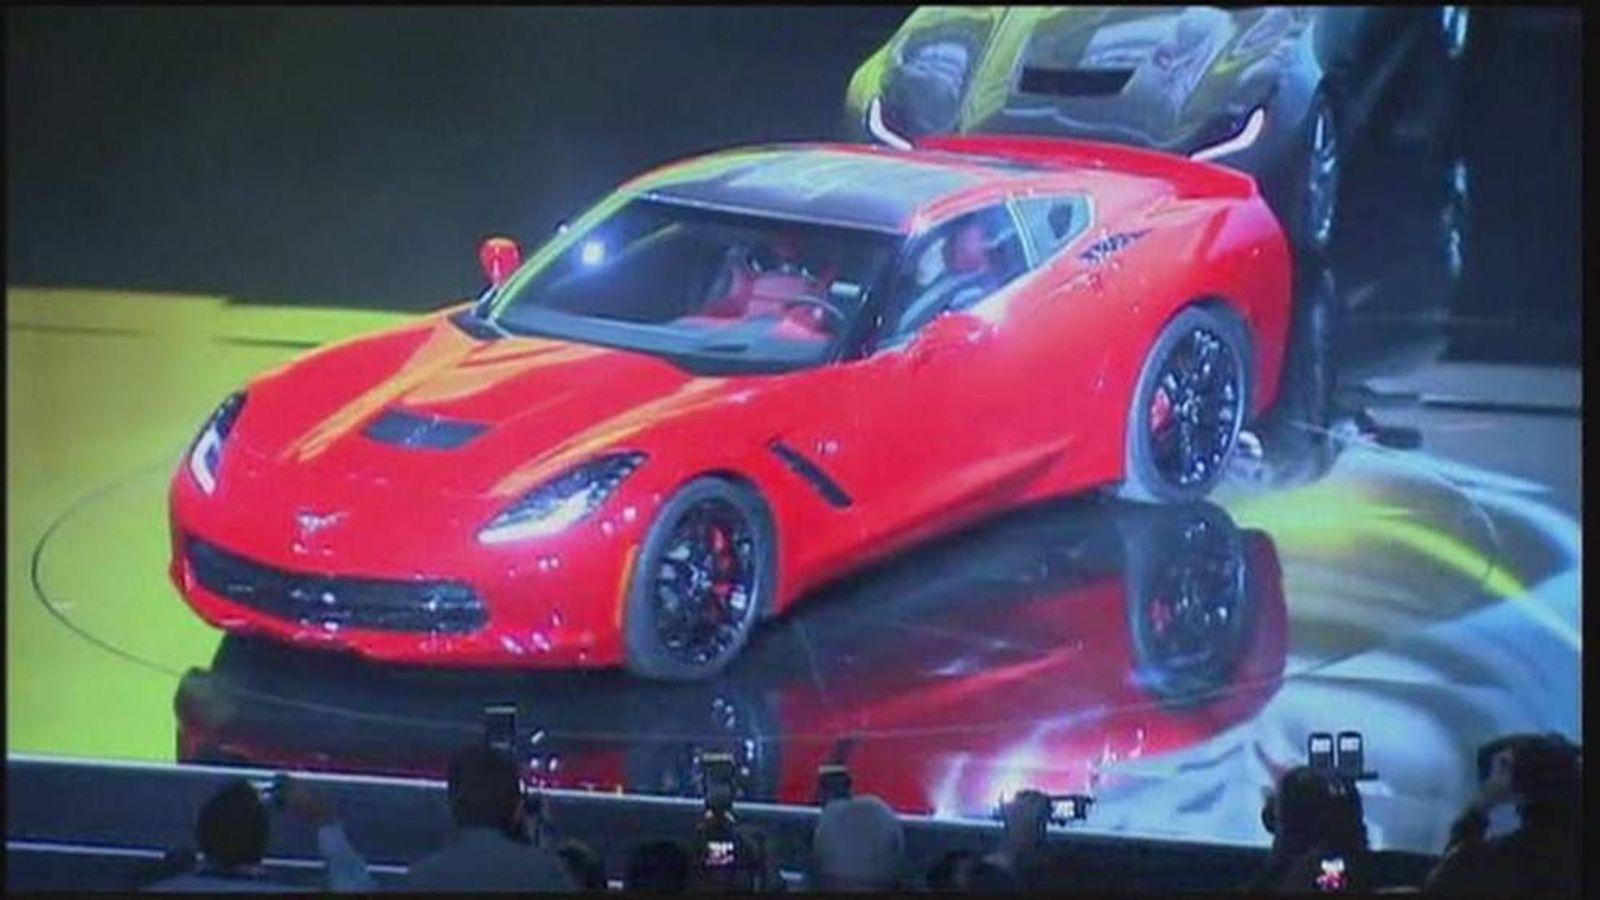 2014 Chevy Corvette 'stingray' at the Detroit Motor show